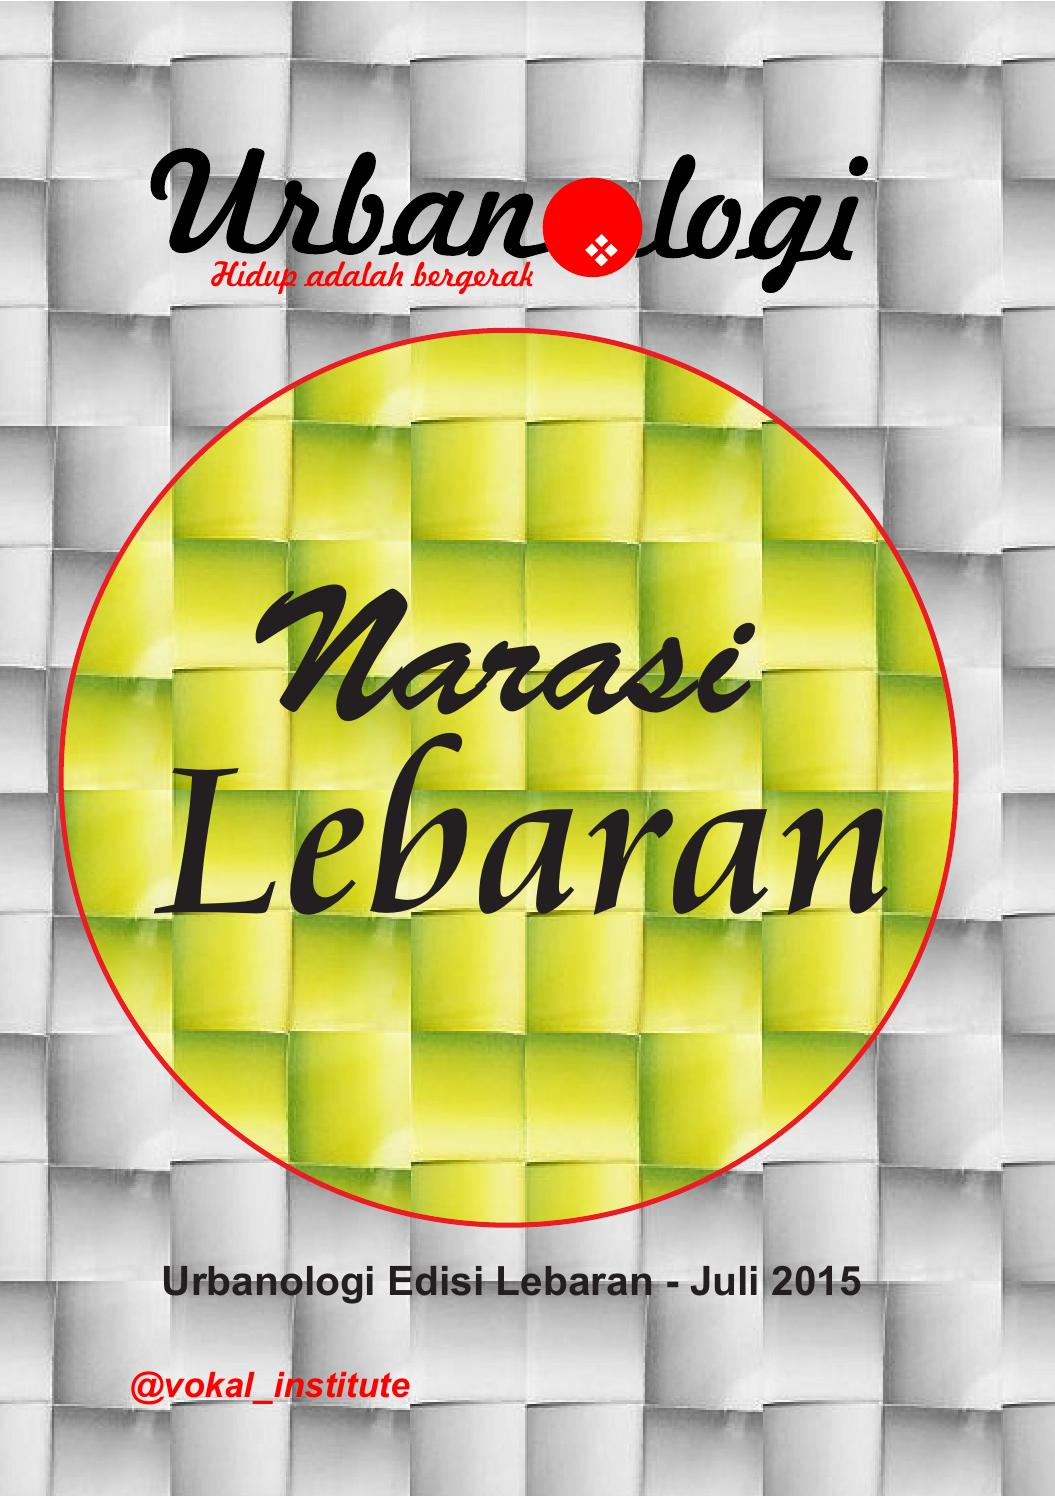 Urbanologi Edisi Lebaran By Muhajir Arrosyid Issuu